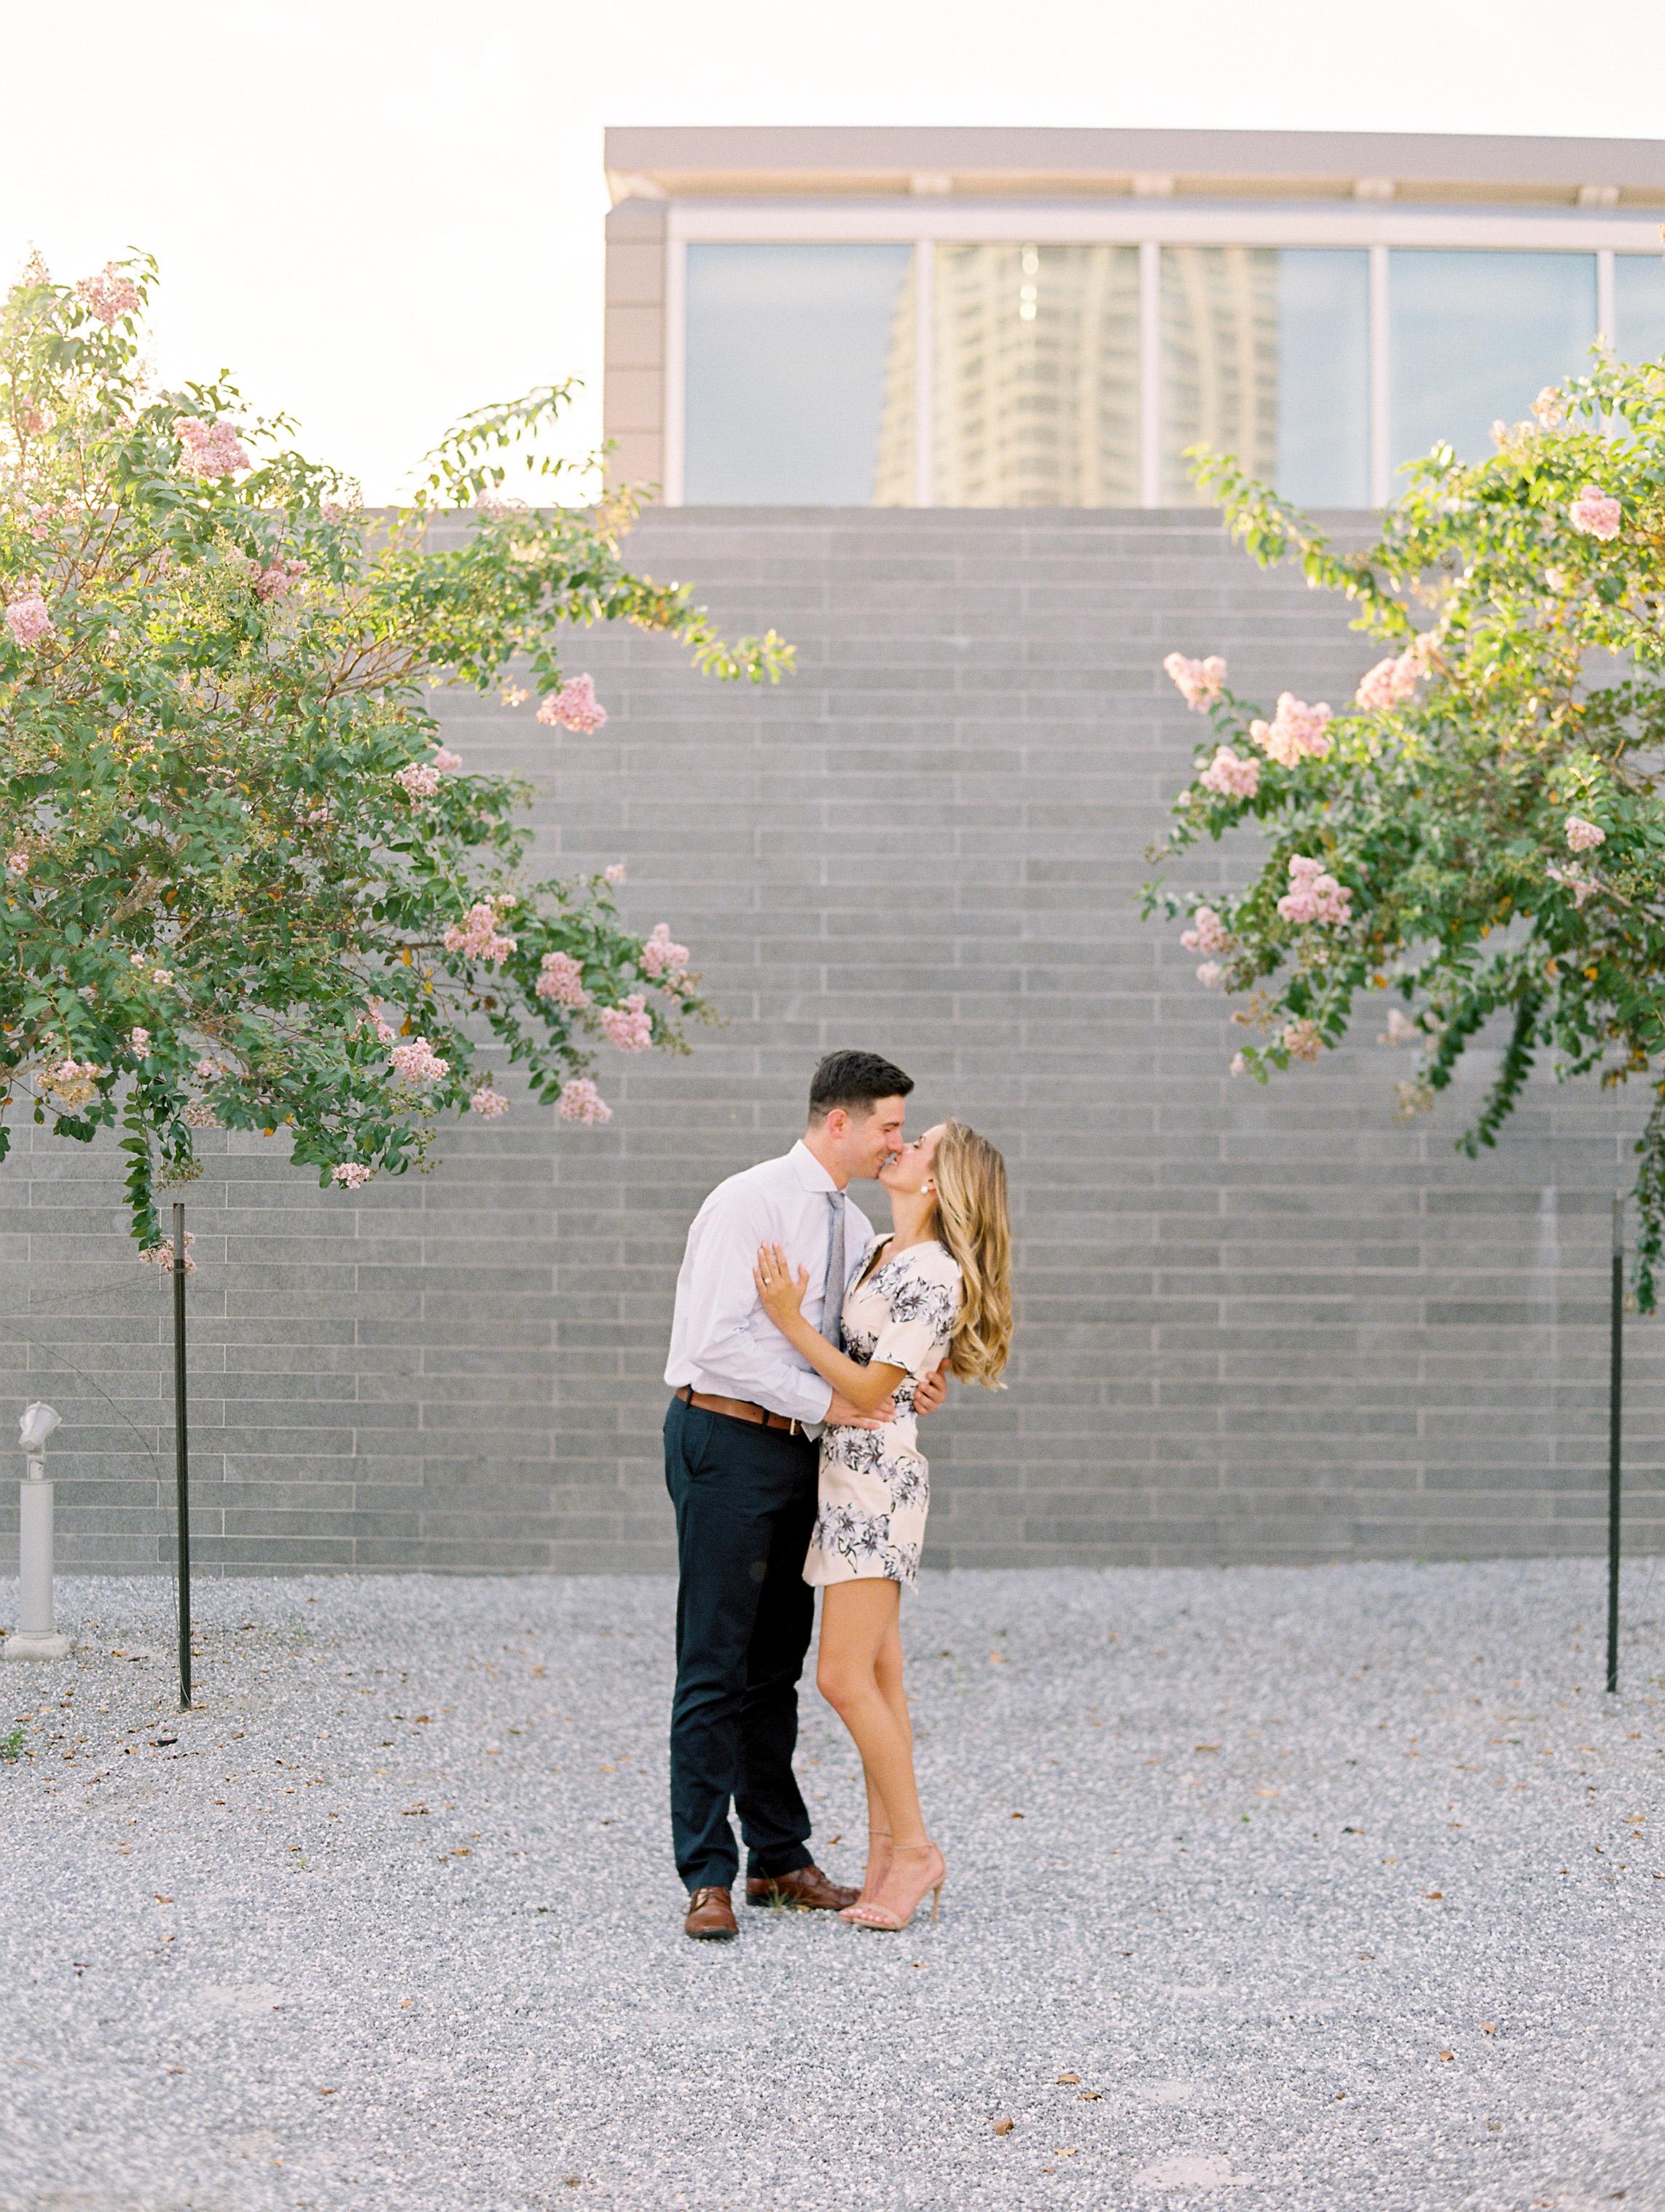 Dana-Fernandez-Photography-Houston-Engagement-Wedding-Film-Photographer-13.jpg